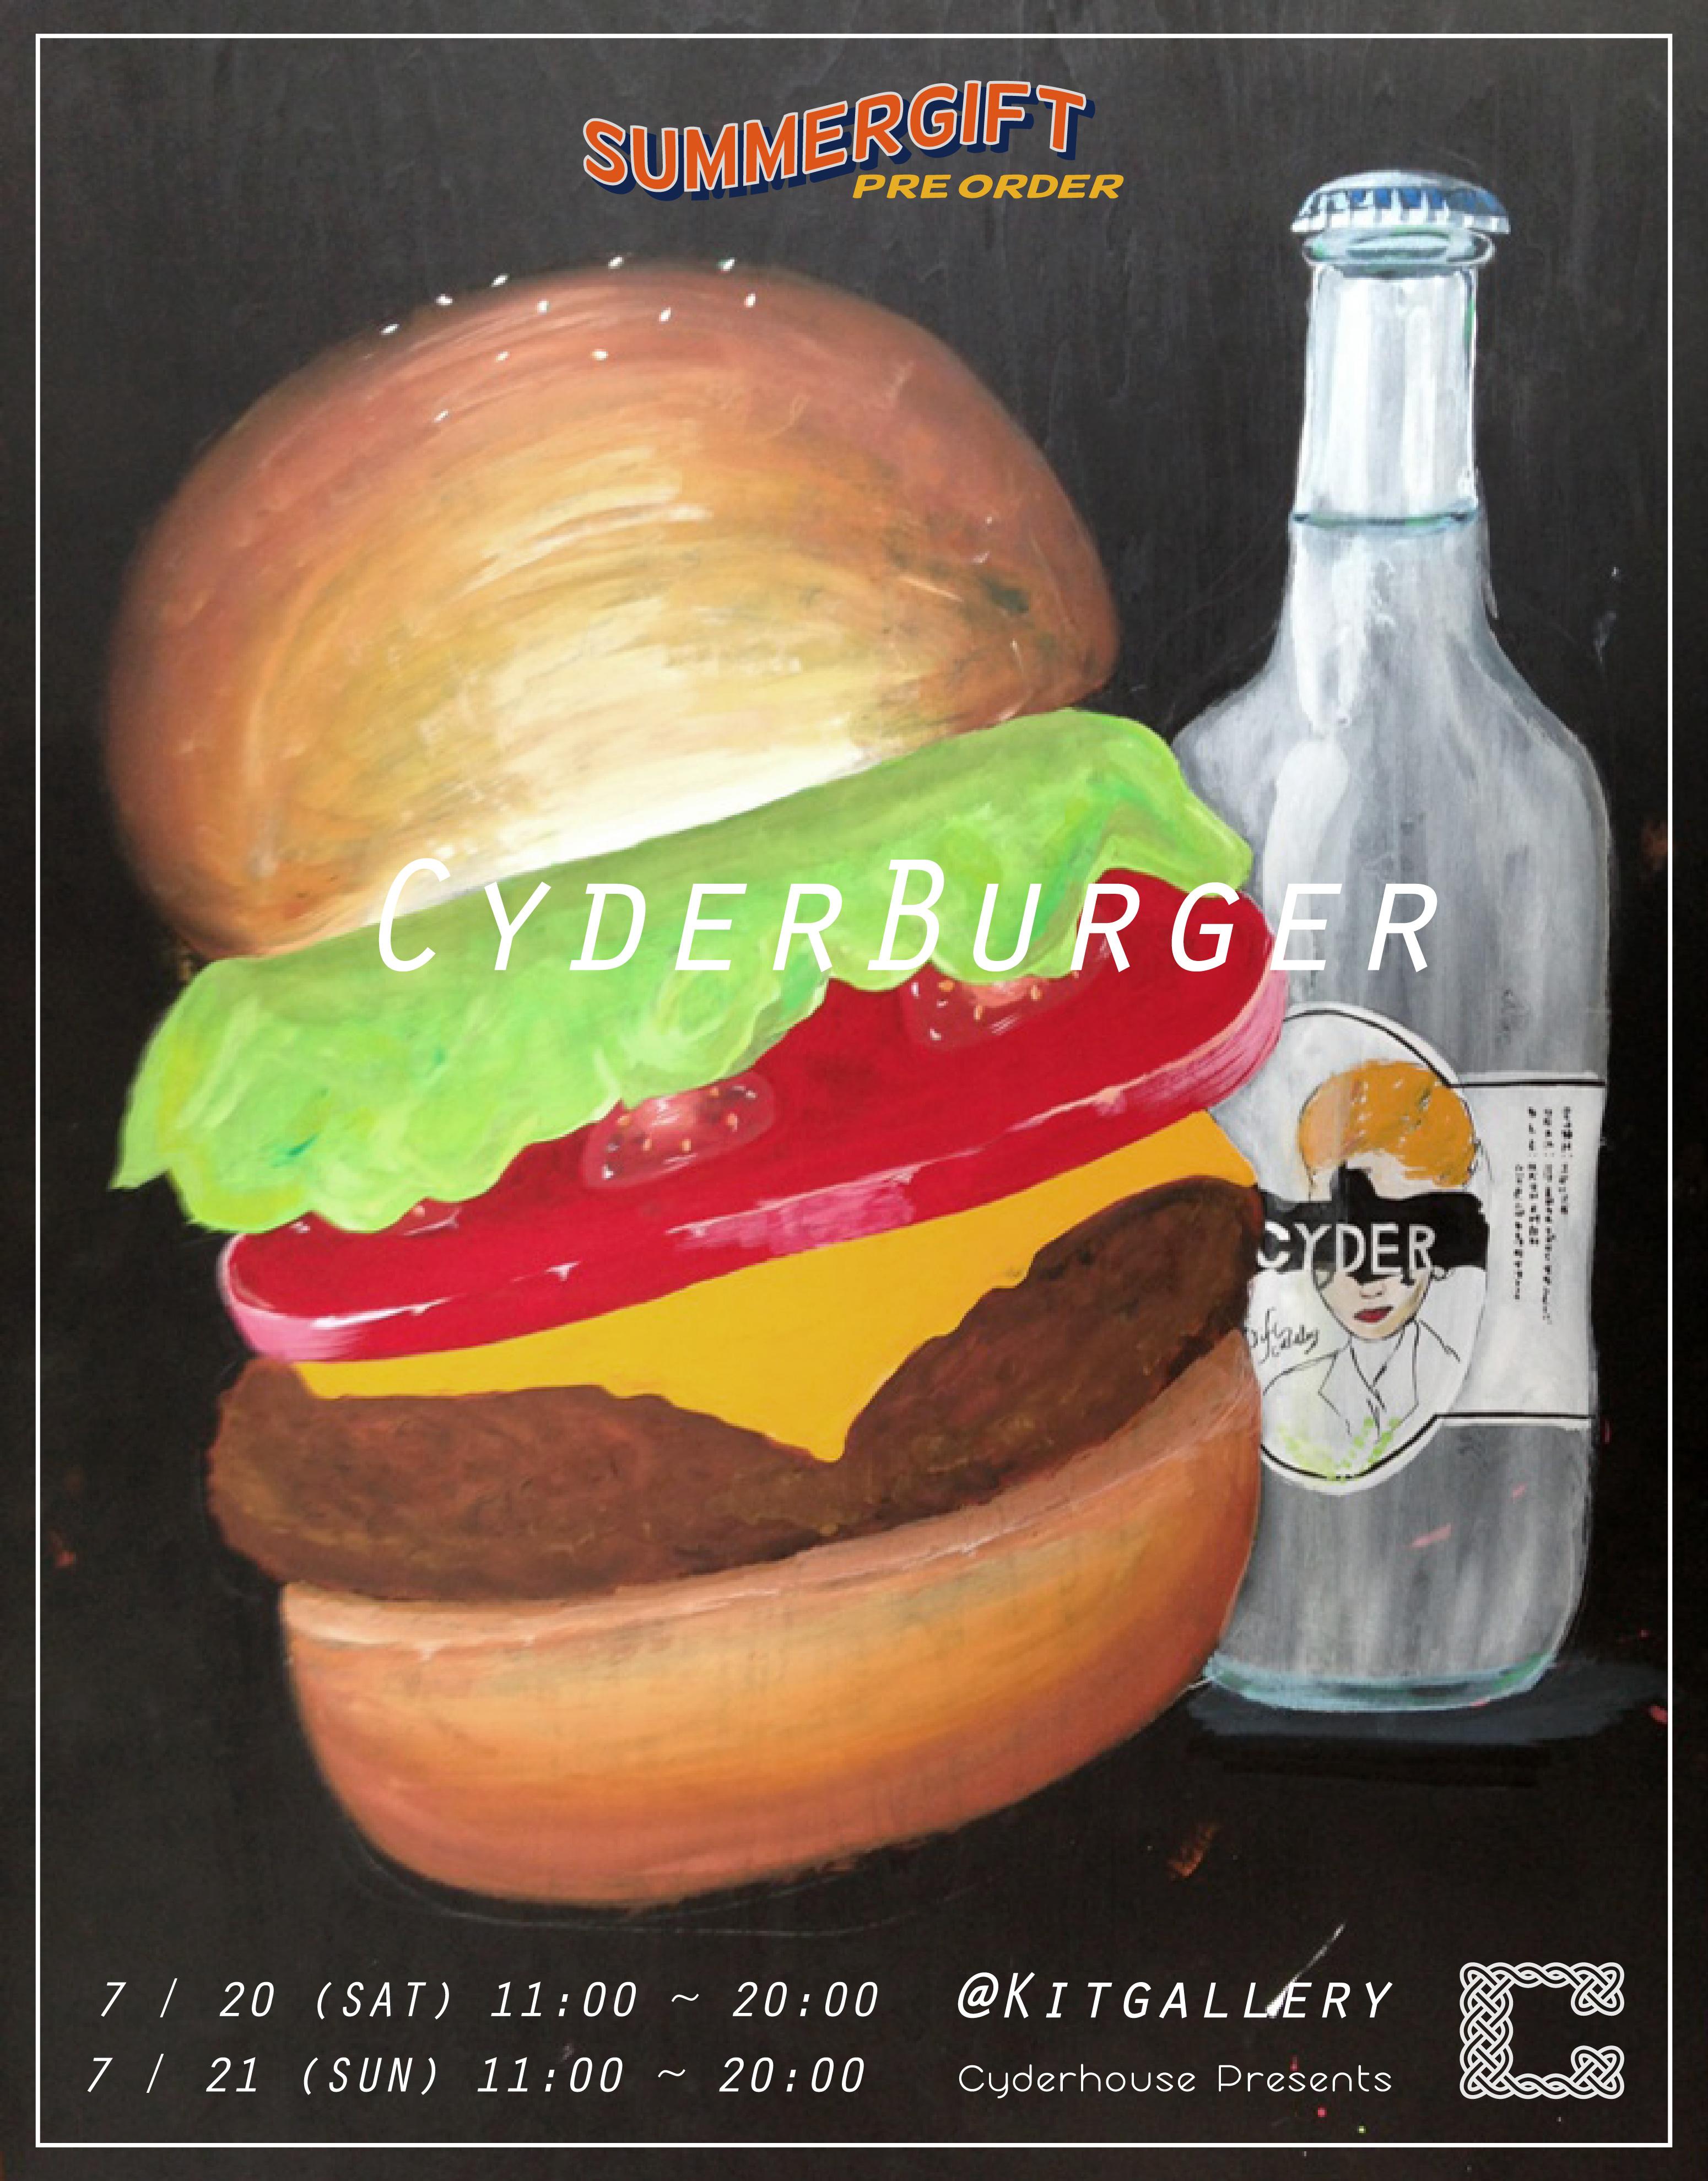 http://kit-gallery.com/schedule/files/cyderburger.jpg